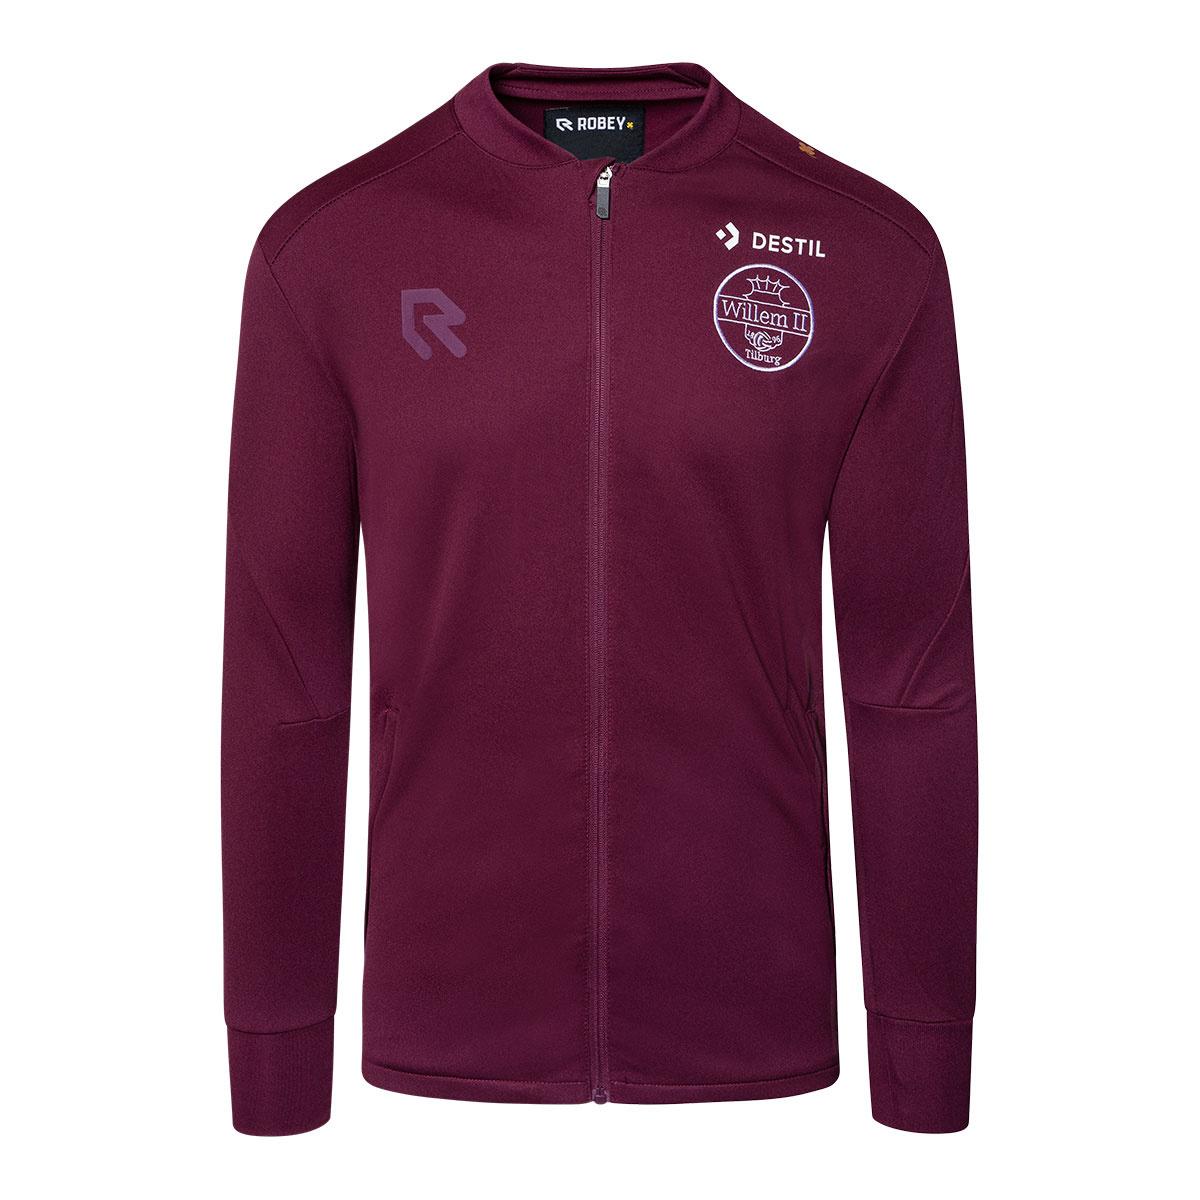 Robey Willem II trainingjacket junior 2019-2020